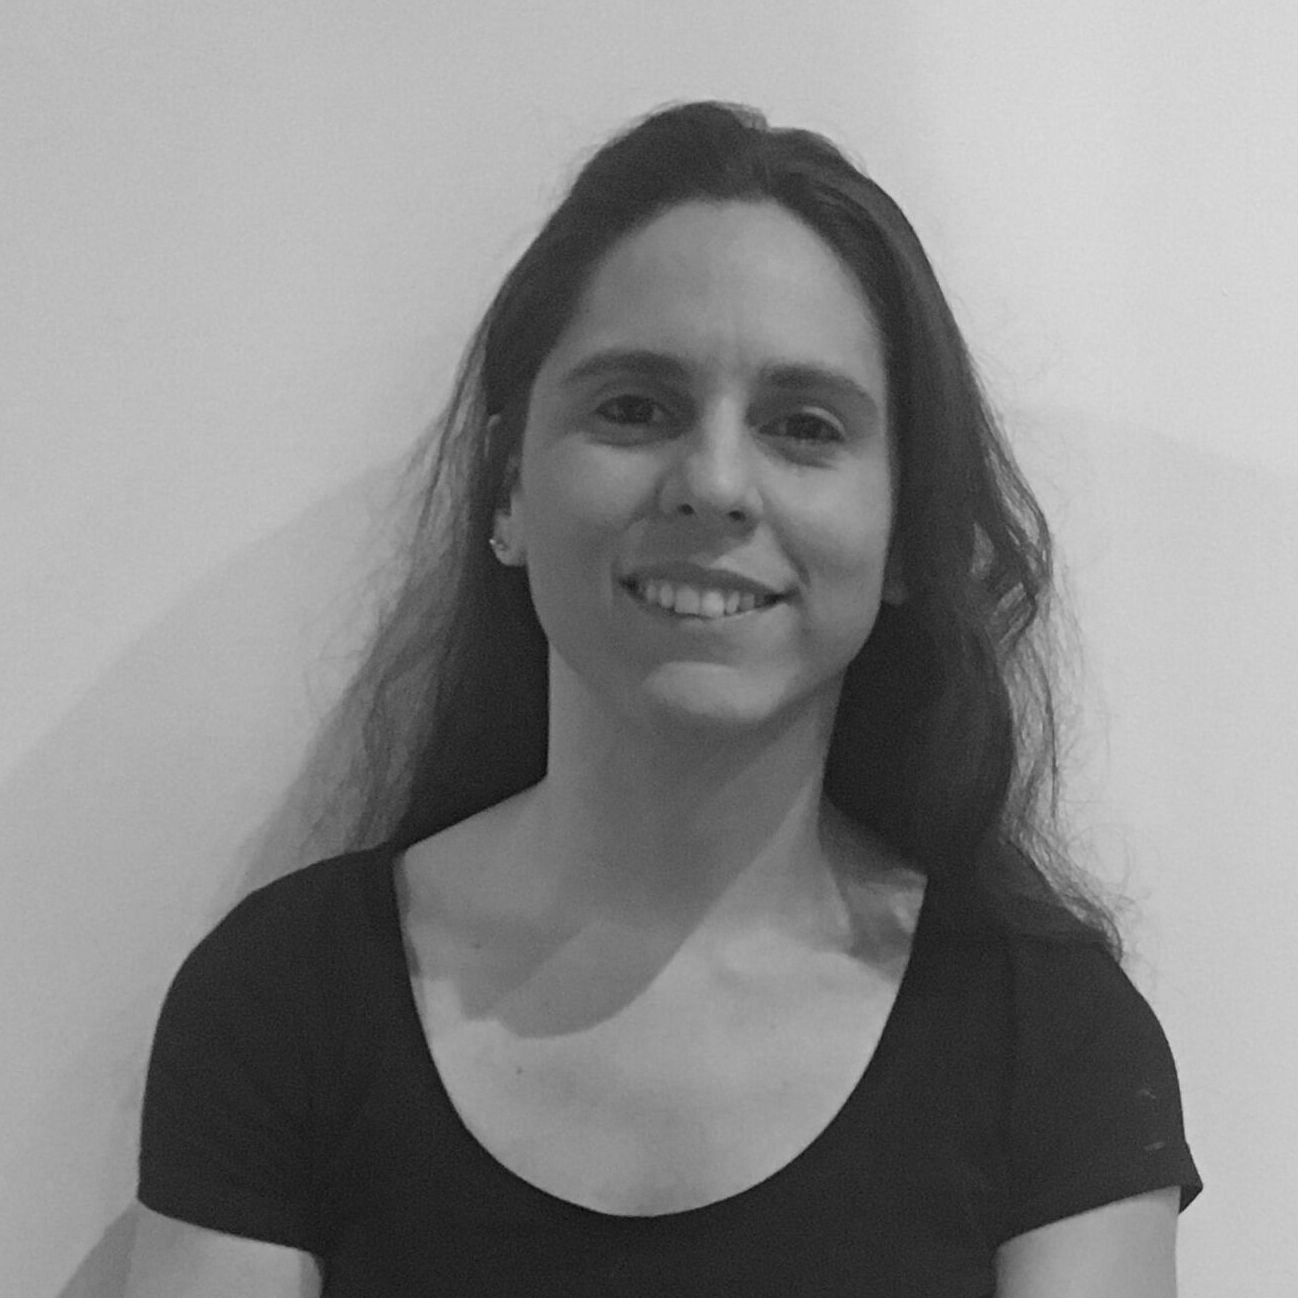 Evelin Garcia, Software Engineer